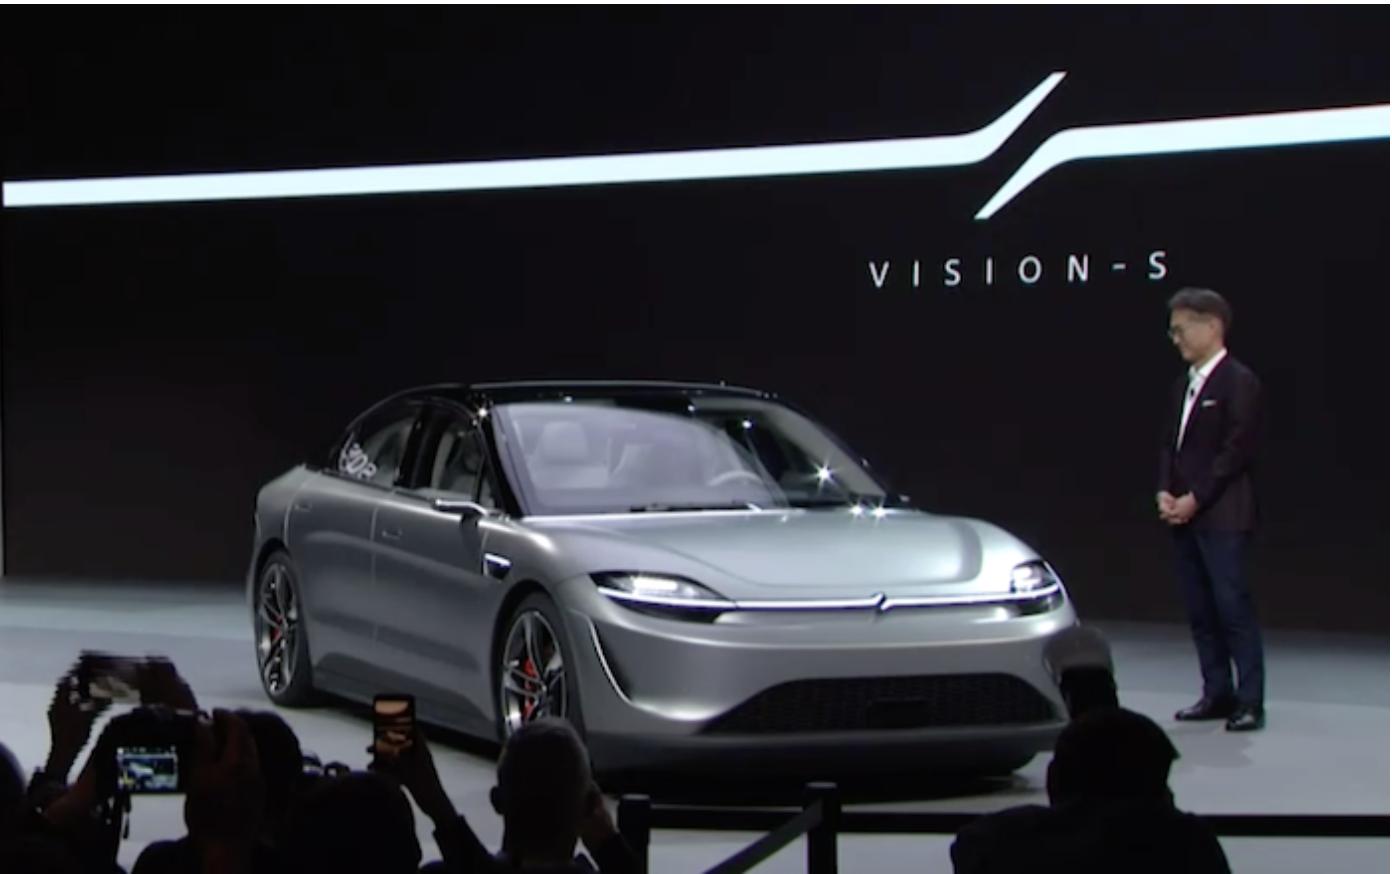 吉田憲一郎為索尼Vision-S揭幕。直播截圖